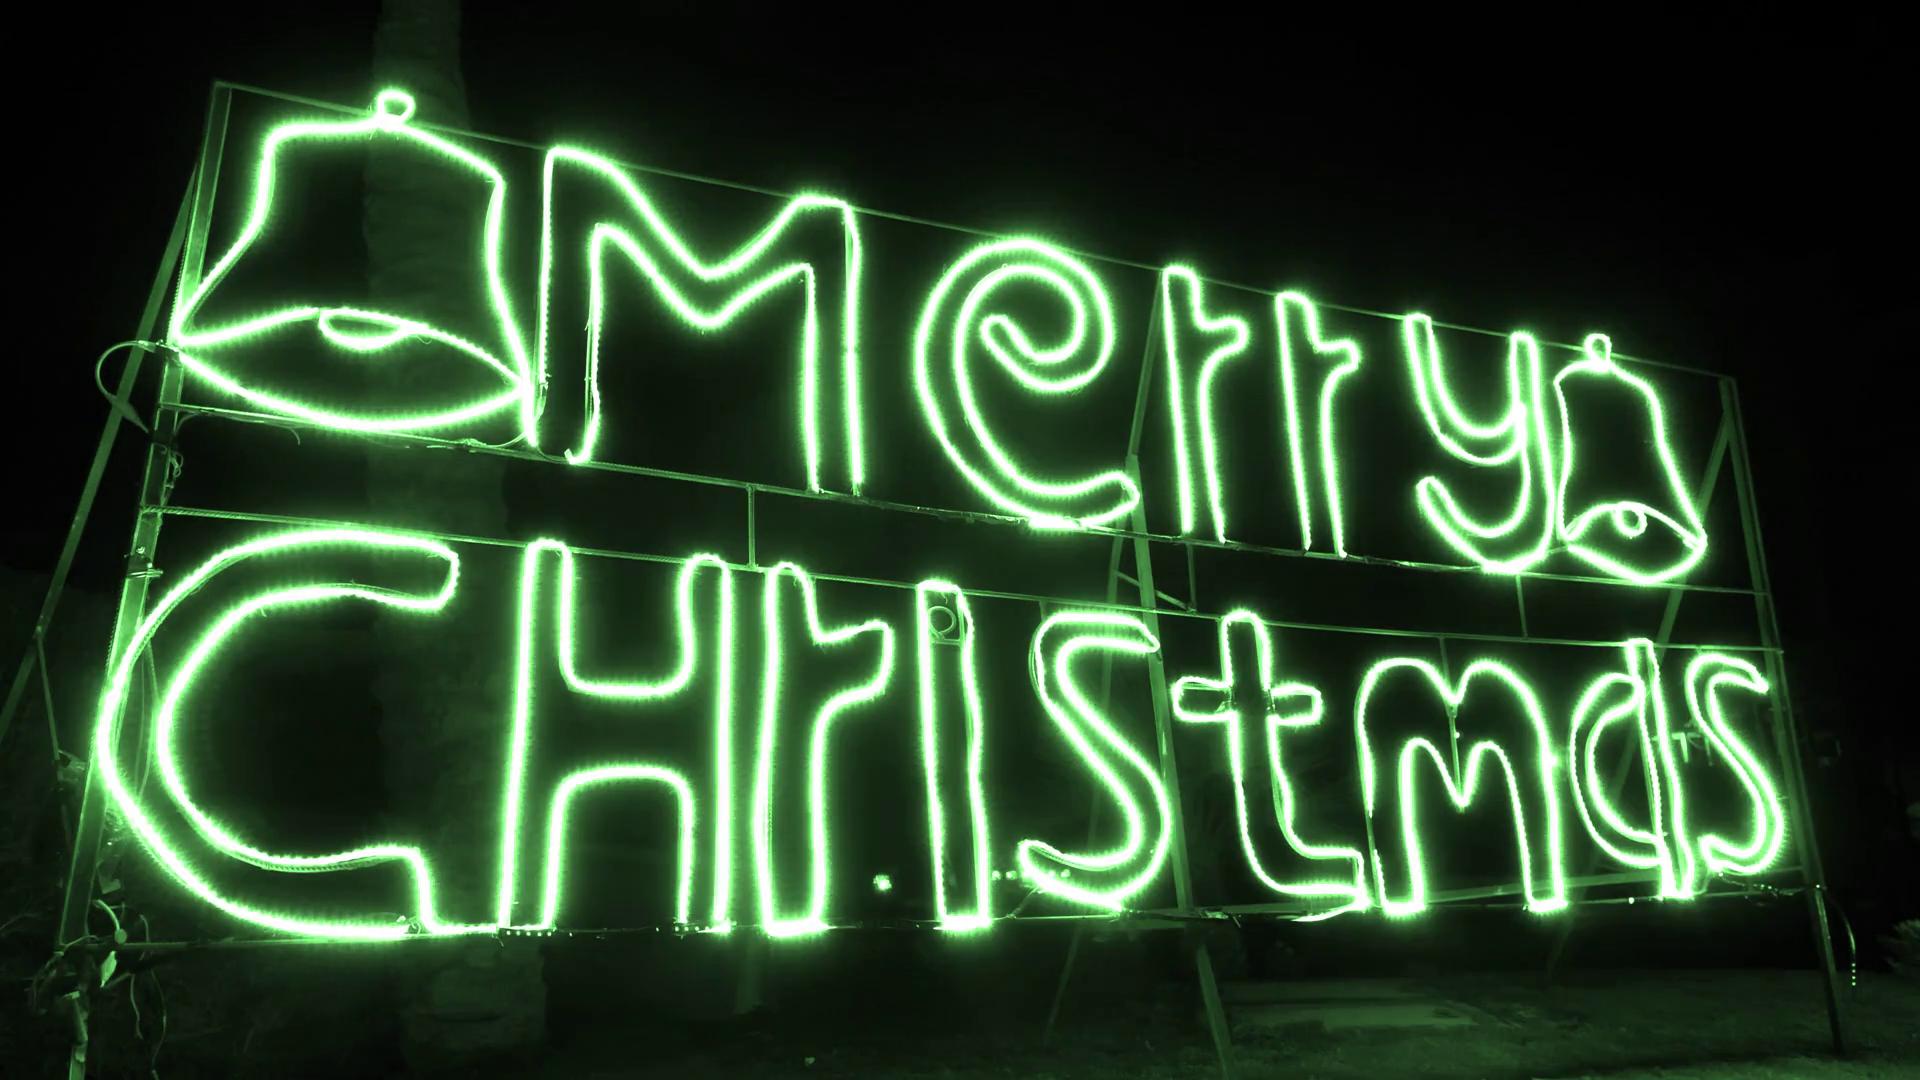 videoblocks green neon night signboard with message merry christmas hne0az4j7l thumbnail 1080 09